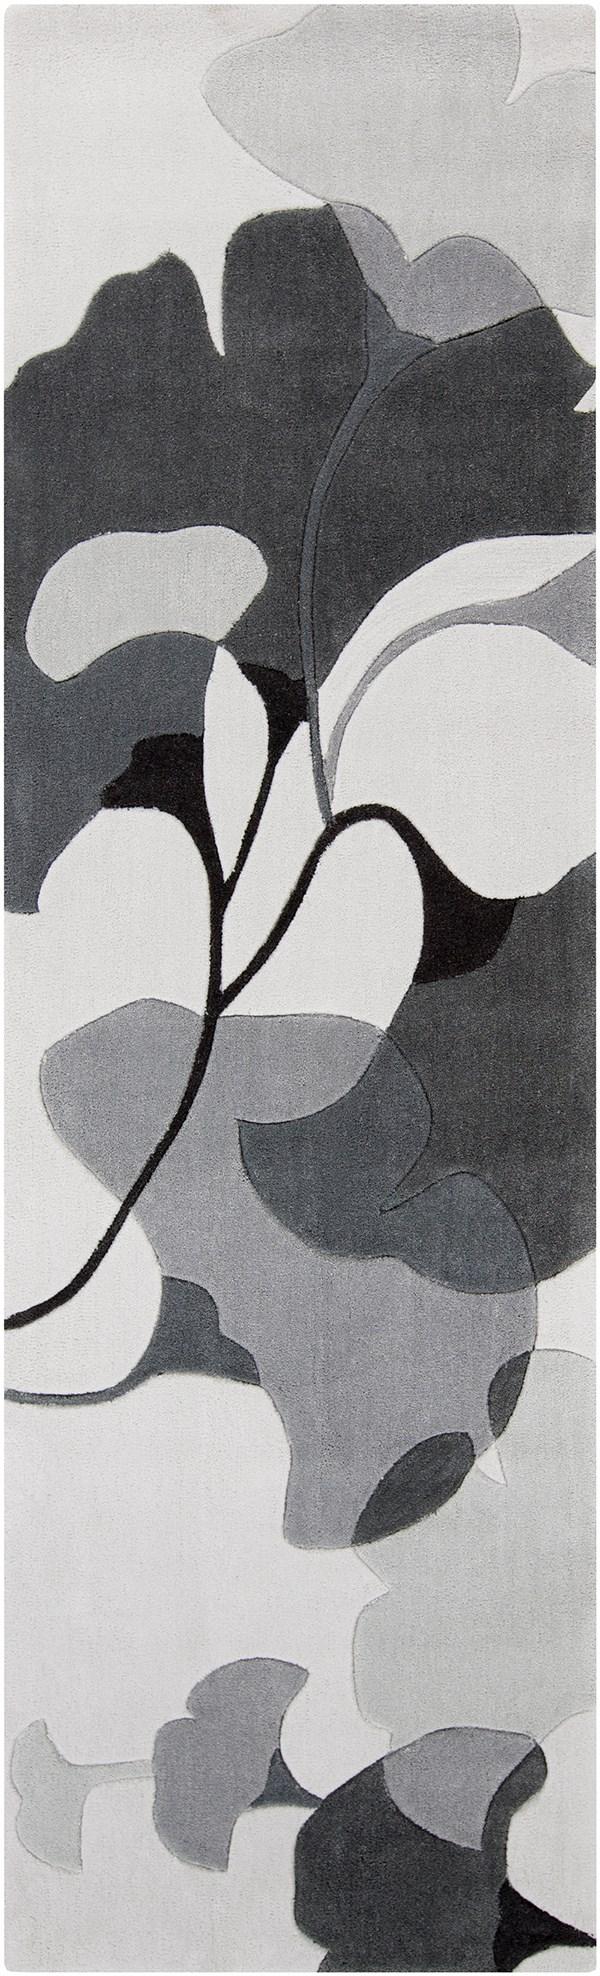 Icicle, Flint Gray, Iron Ore Floral / Botanical Area Rug